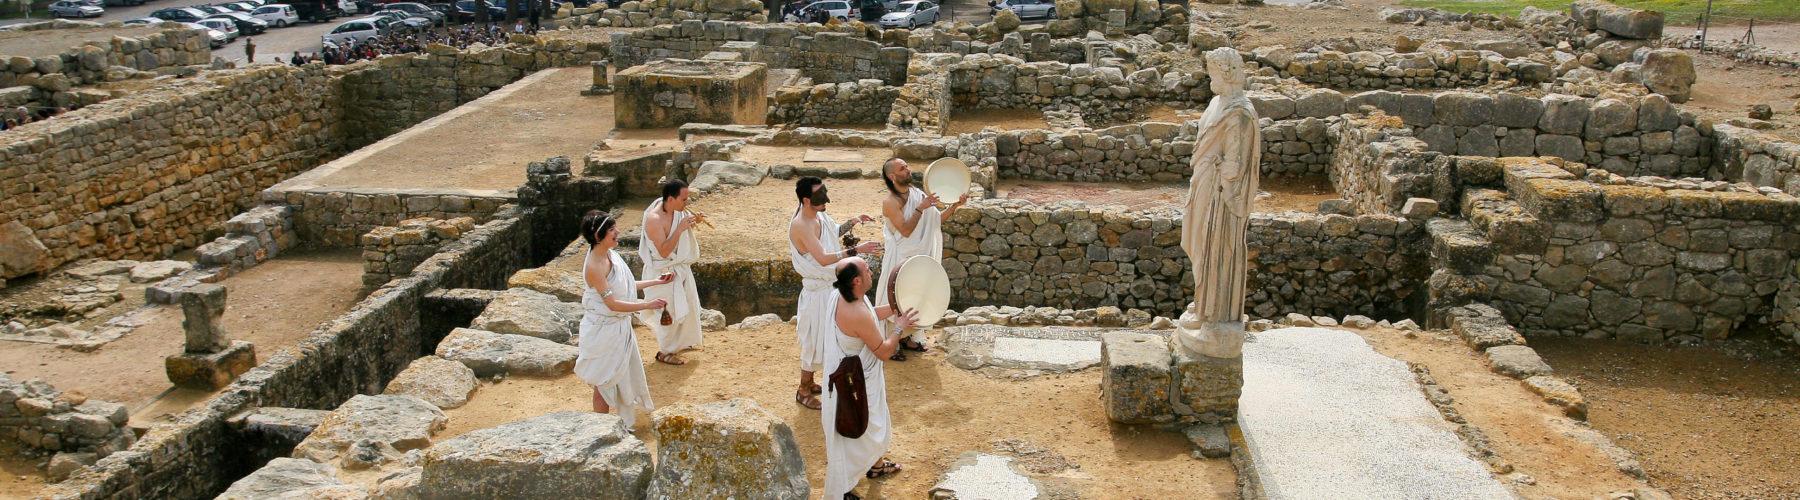 Musees - Musee Arqueologque d'Empúries - Lescala - Empordaturisme